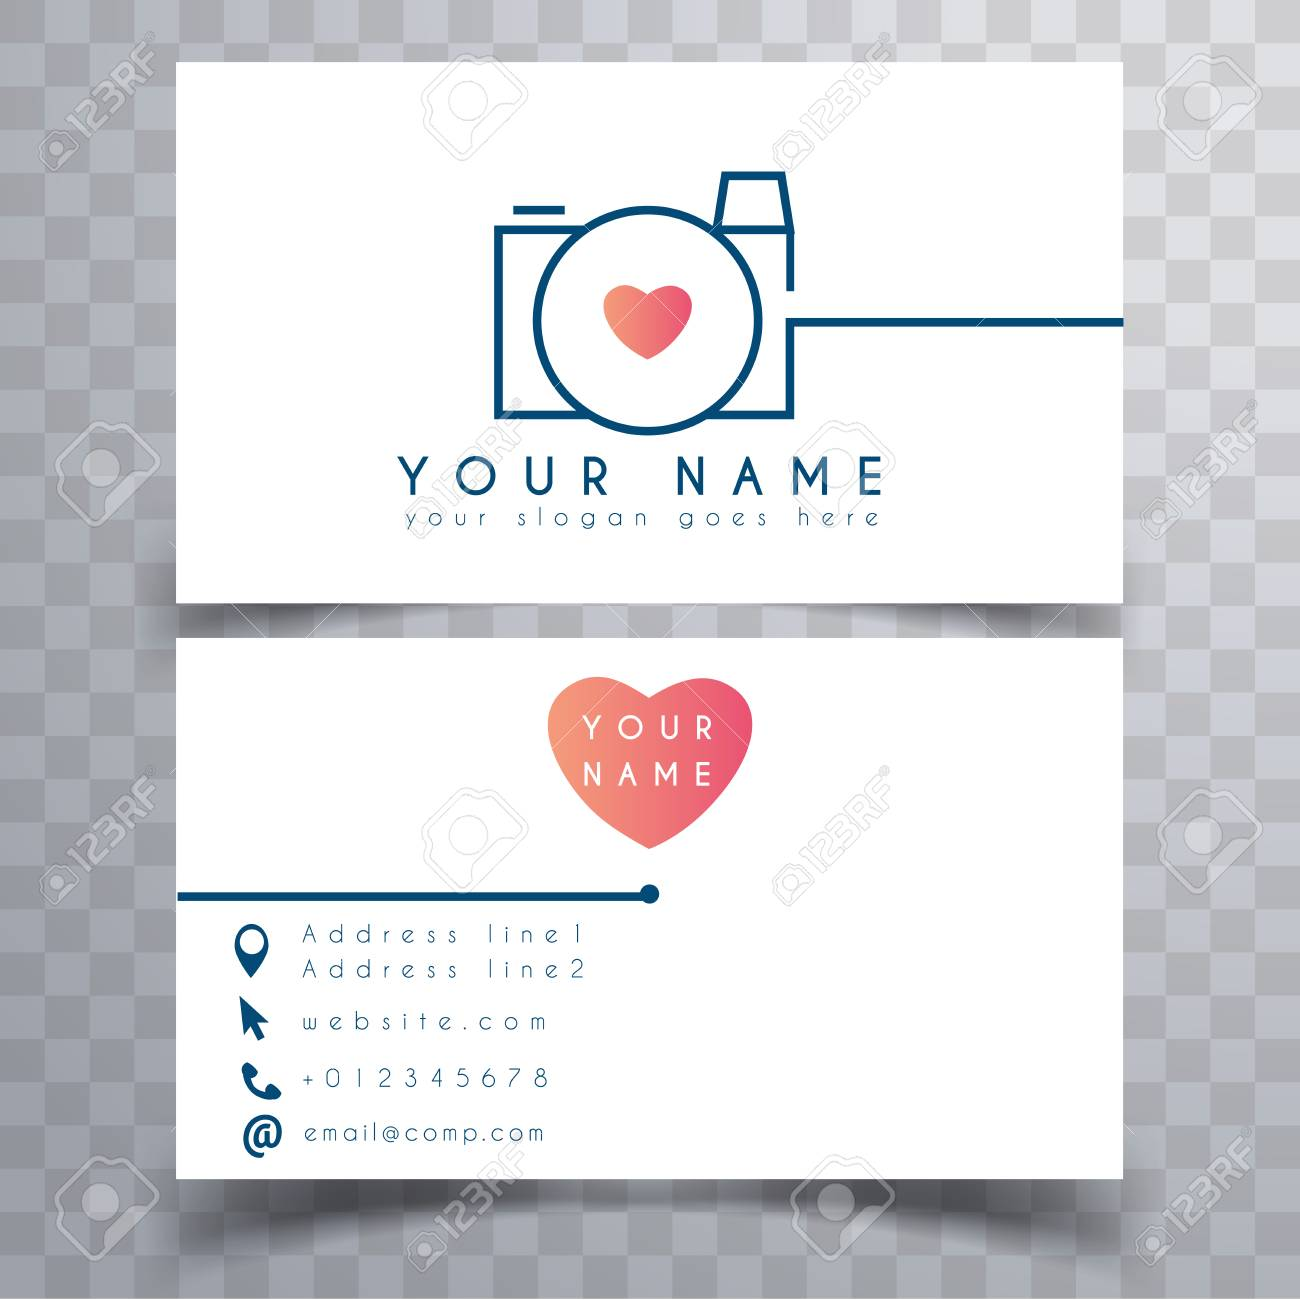 Wedding photographer business card template - 121313603